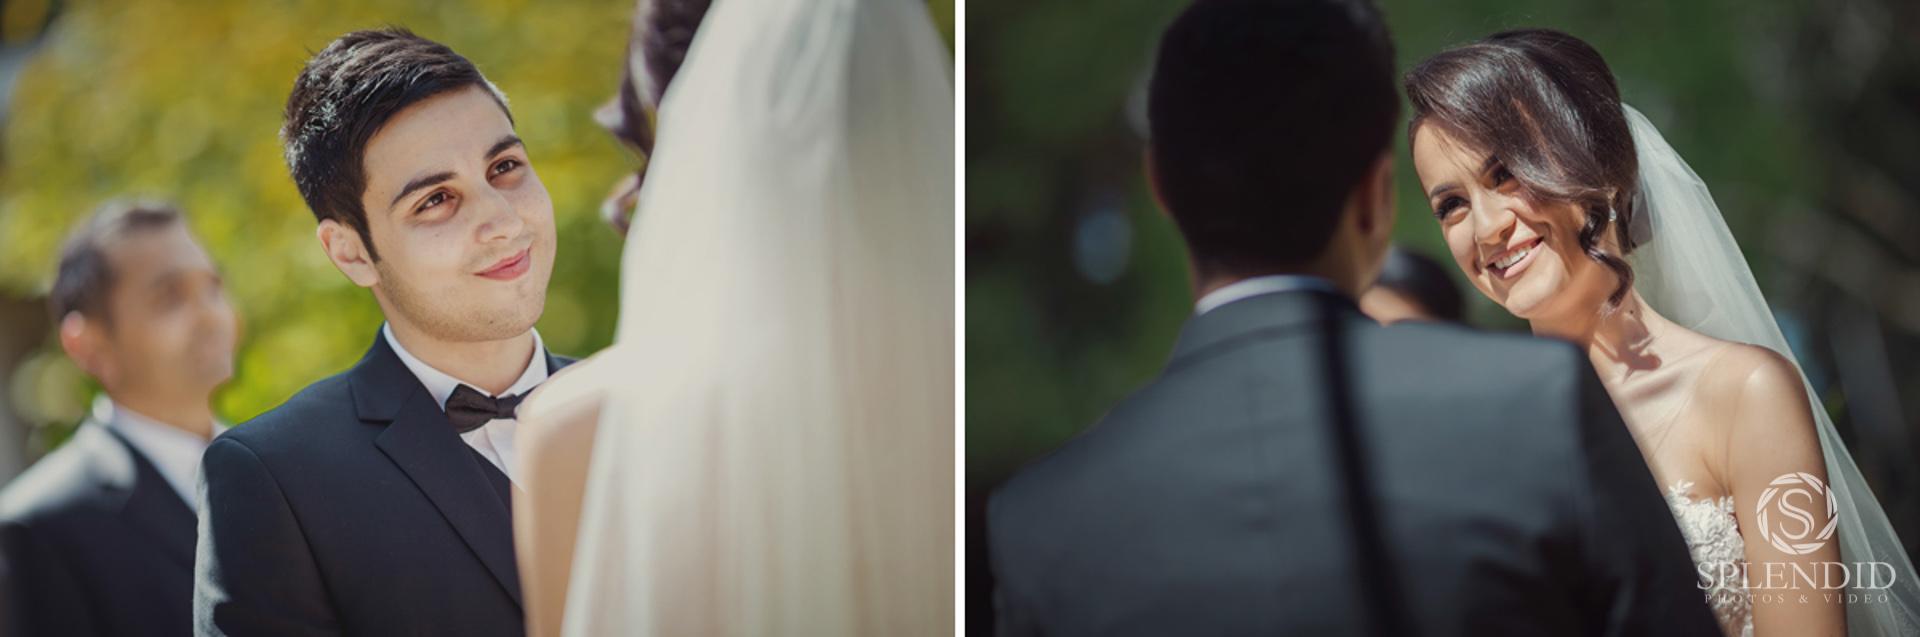 Cem and Cisem Wedding_42